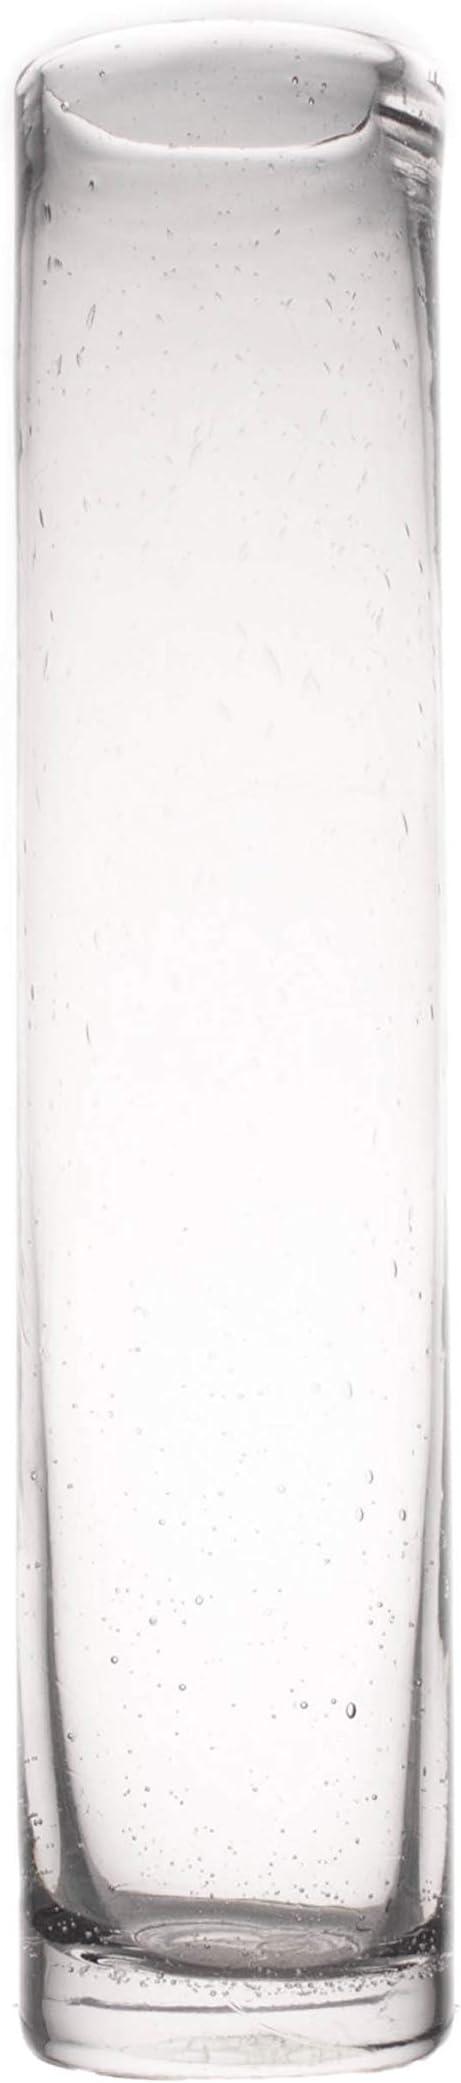 Amazon Com Canvas Home Solano Vase Large Clear Home Kitchen Mission san francisco san francisco solano sonoma ca social media logos canvas prints illustration vectors painting image. amazon com